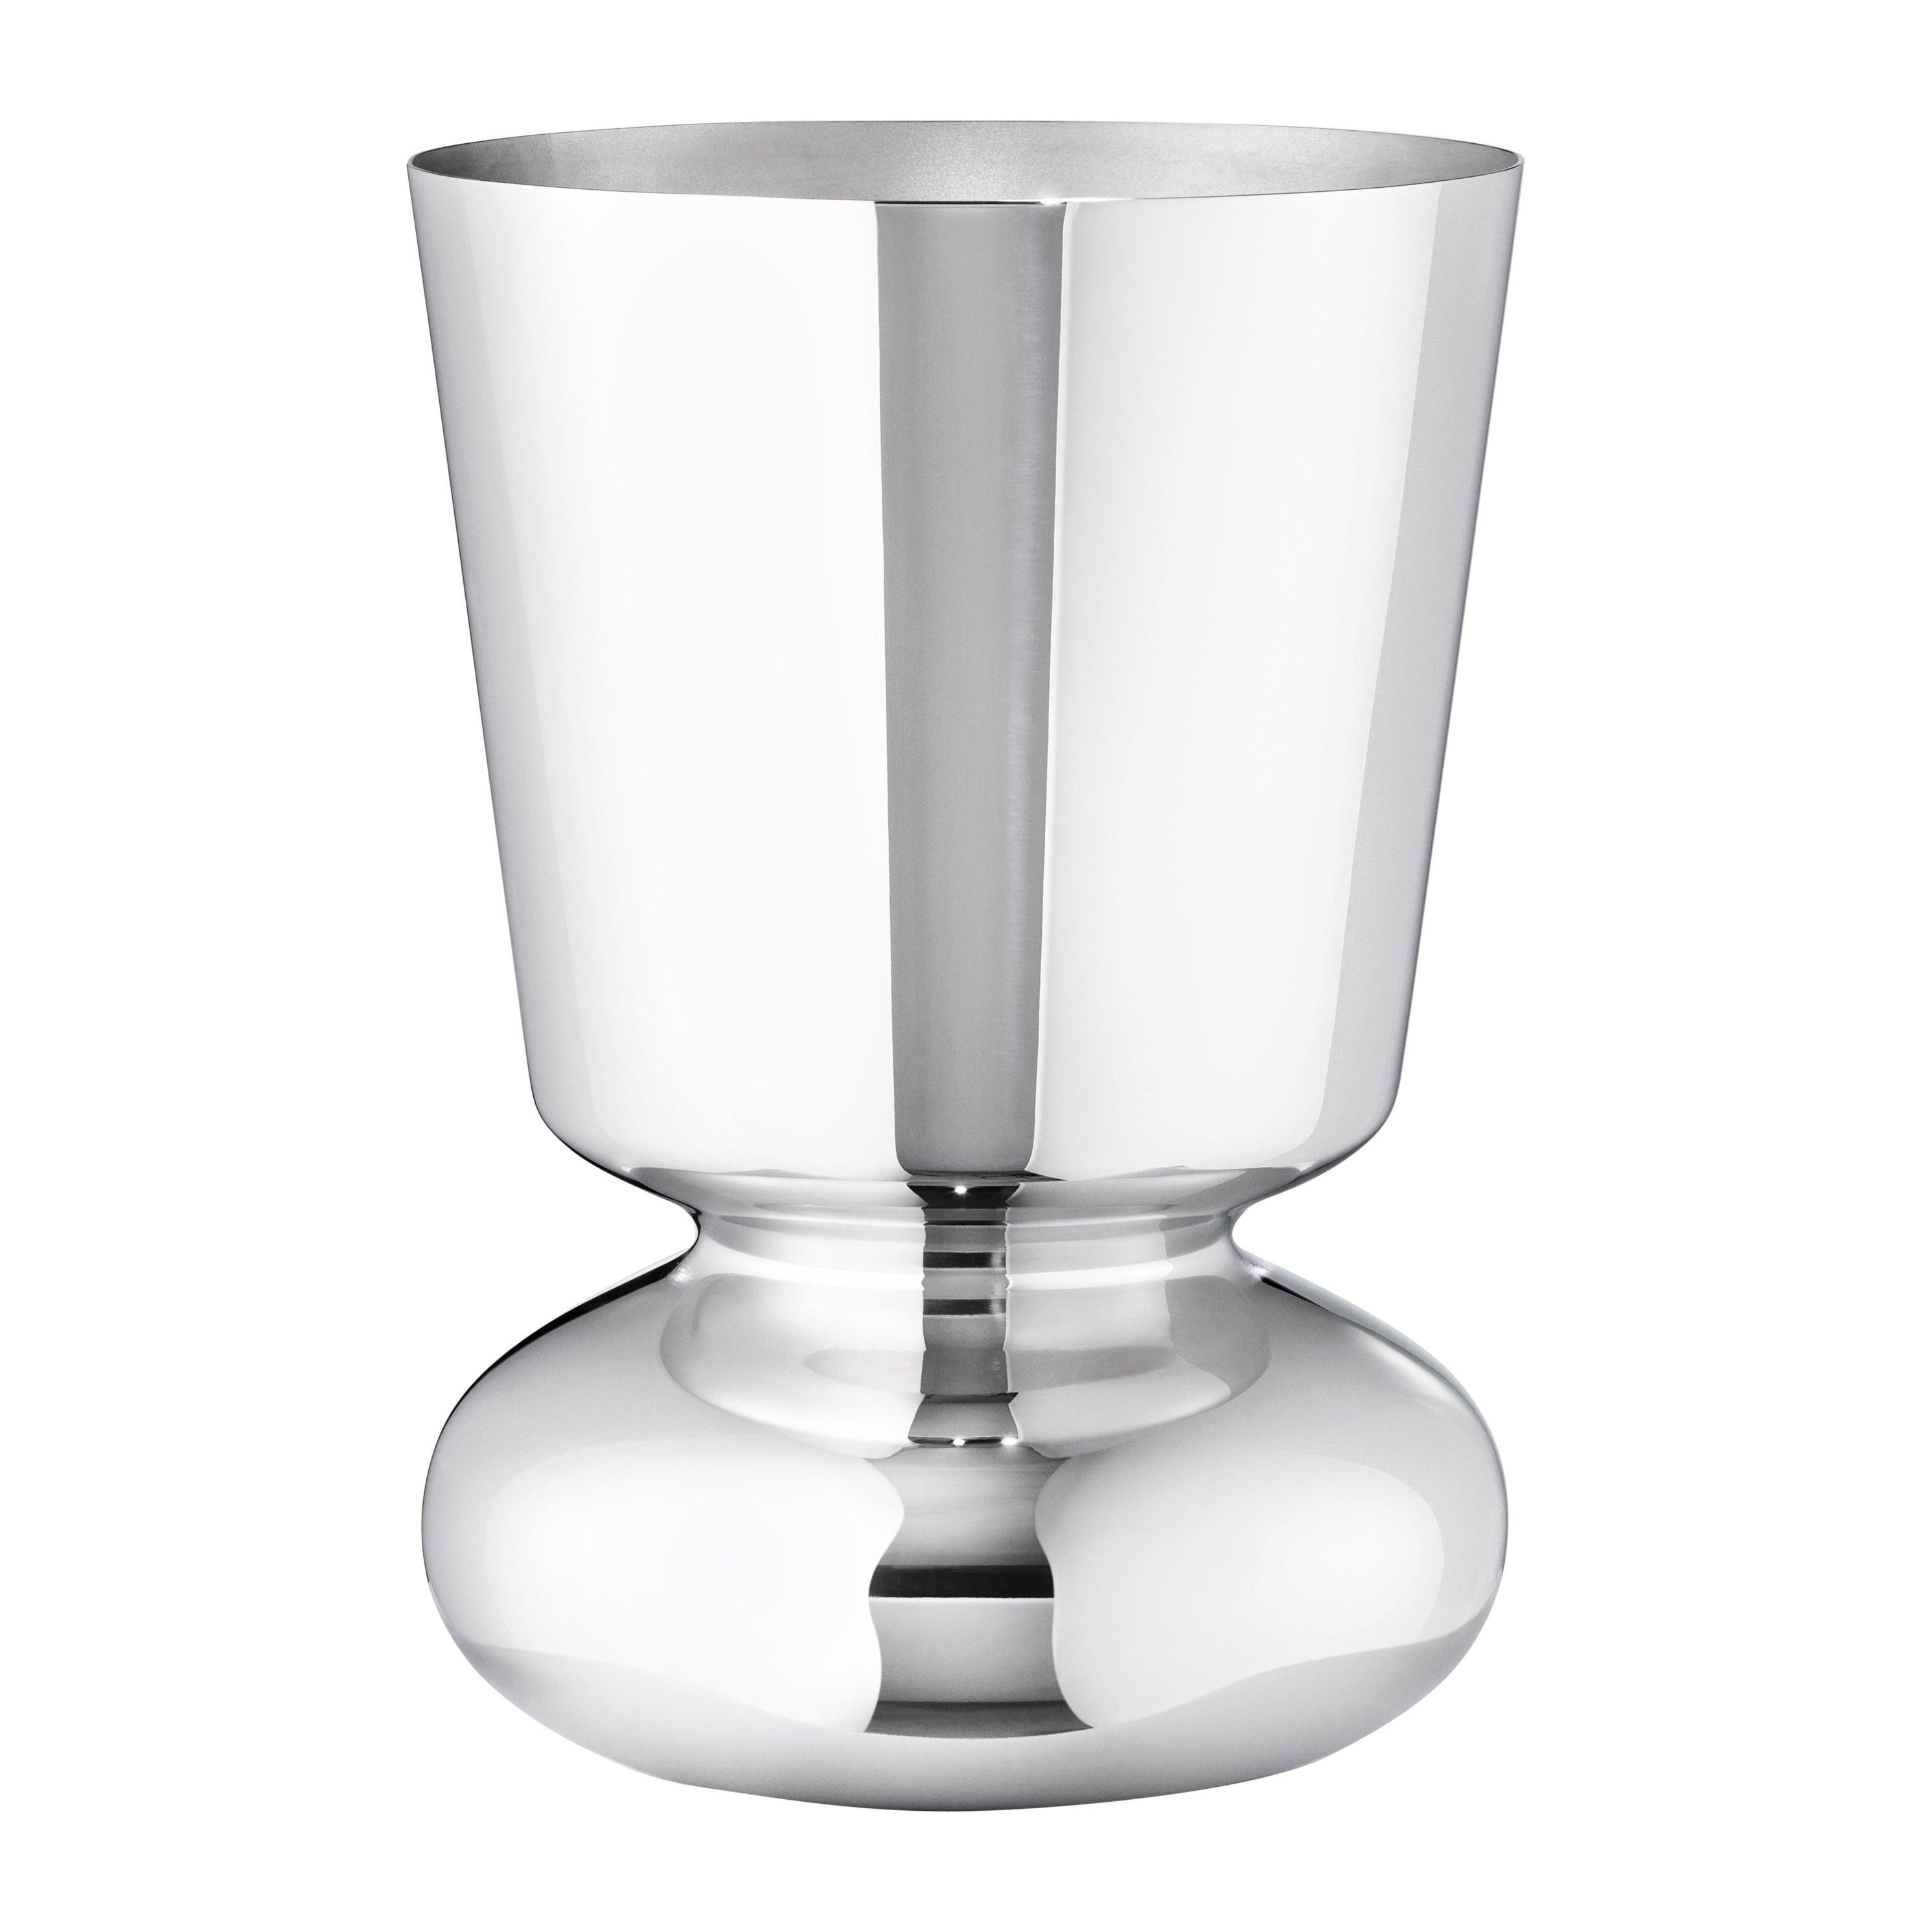 Georg Jensen Alfredo Small Vase in Stainless Steel Finish by Alfredo Häberli